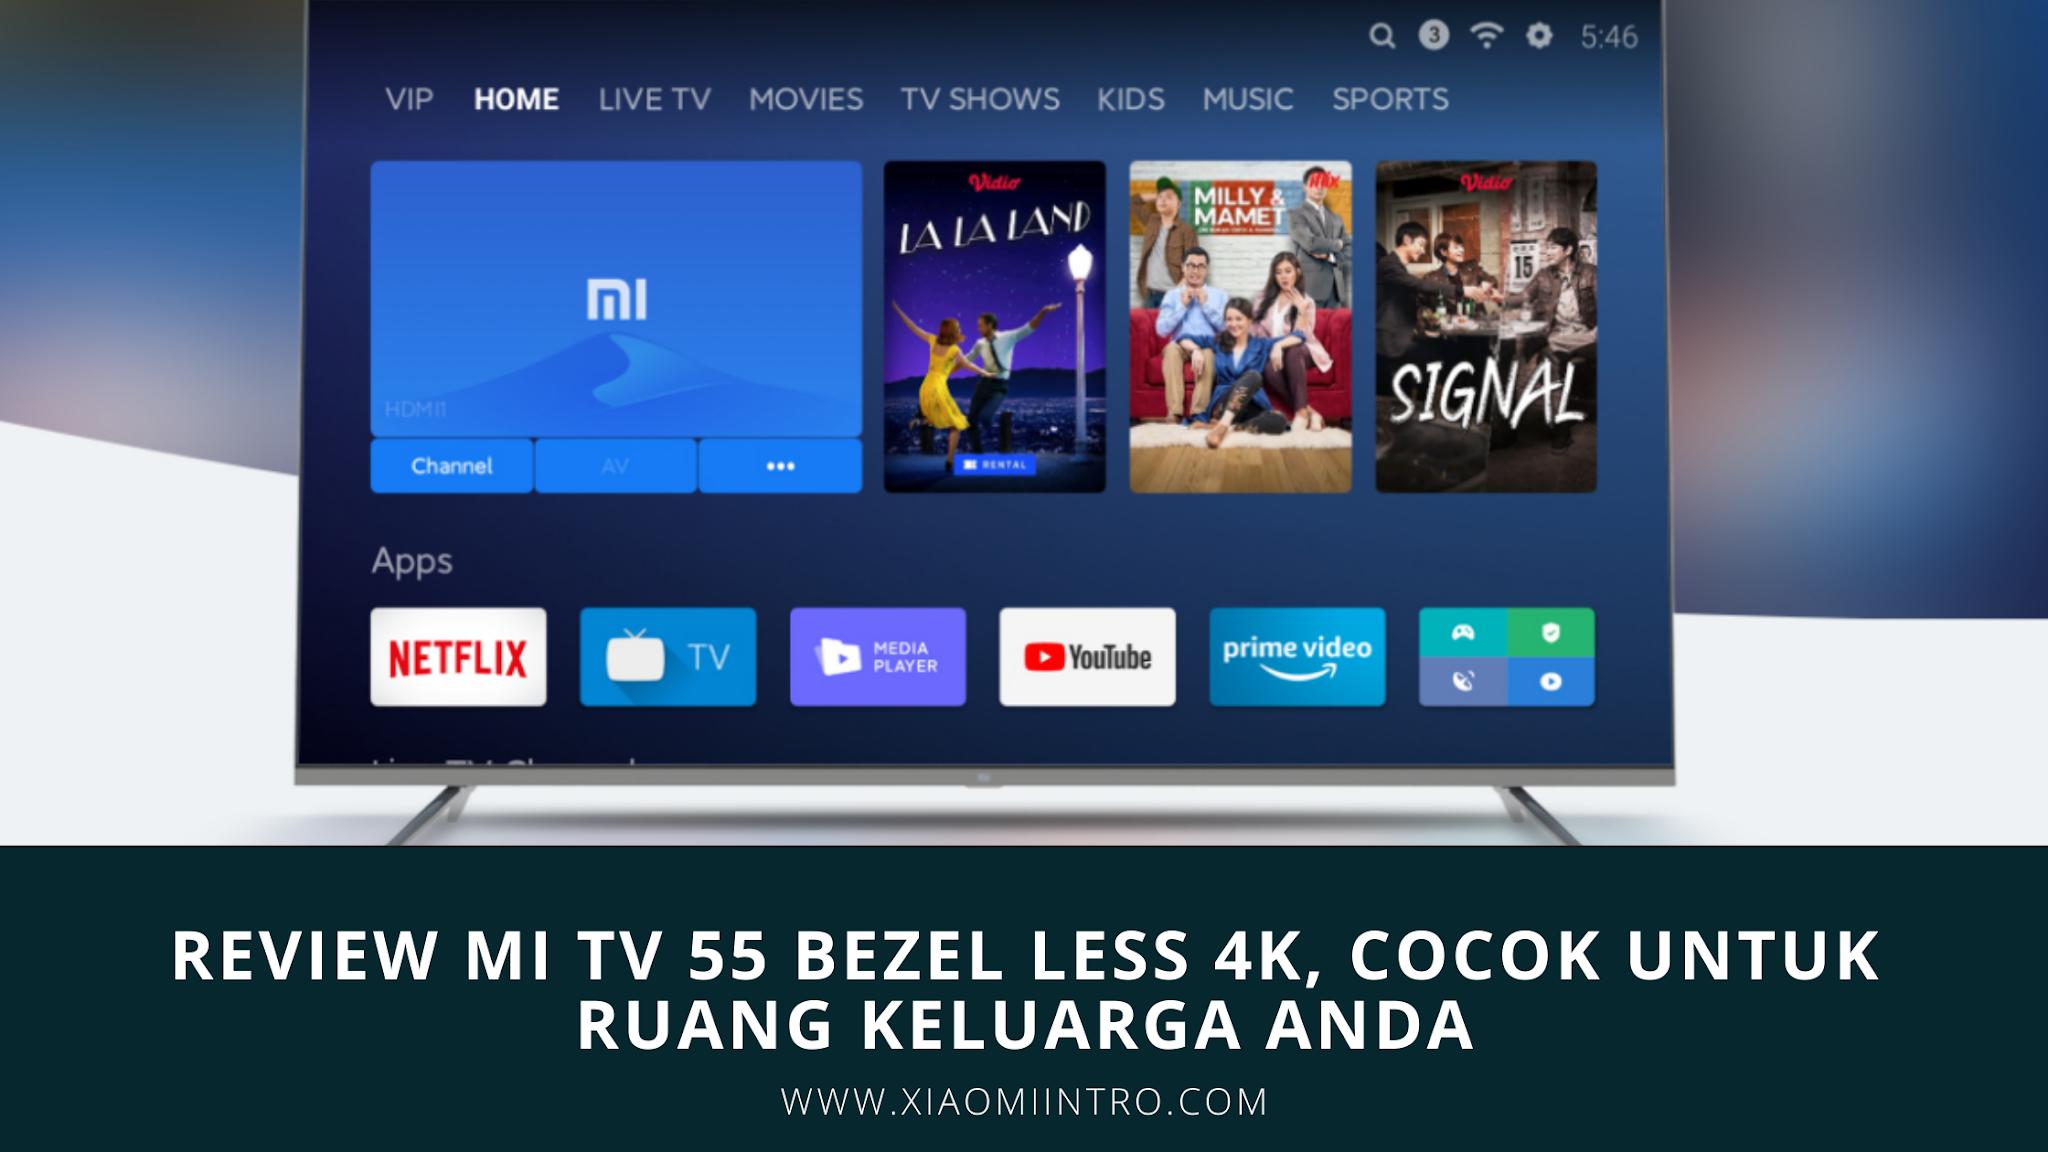 Review Mi TV 55 Bezel Less 4K, Cocok Untuk Ruang Keluarga Anda